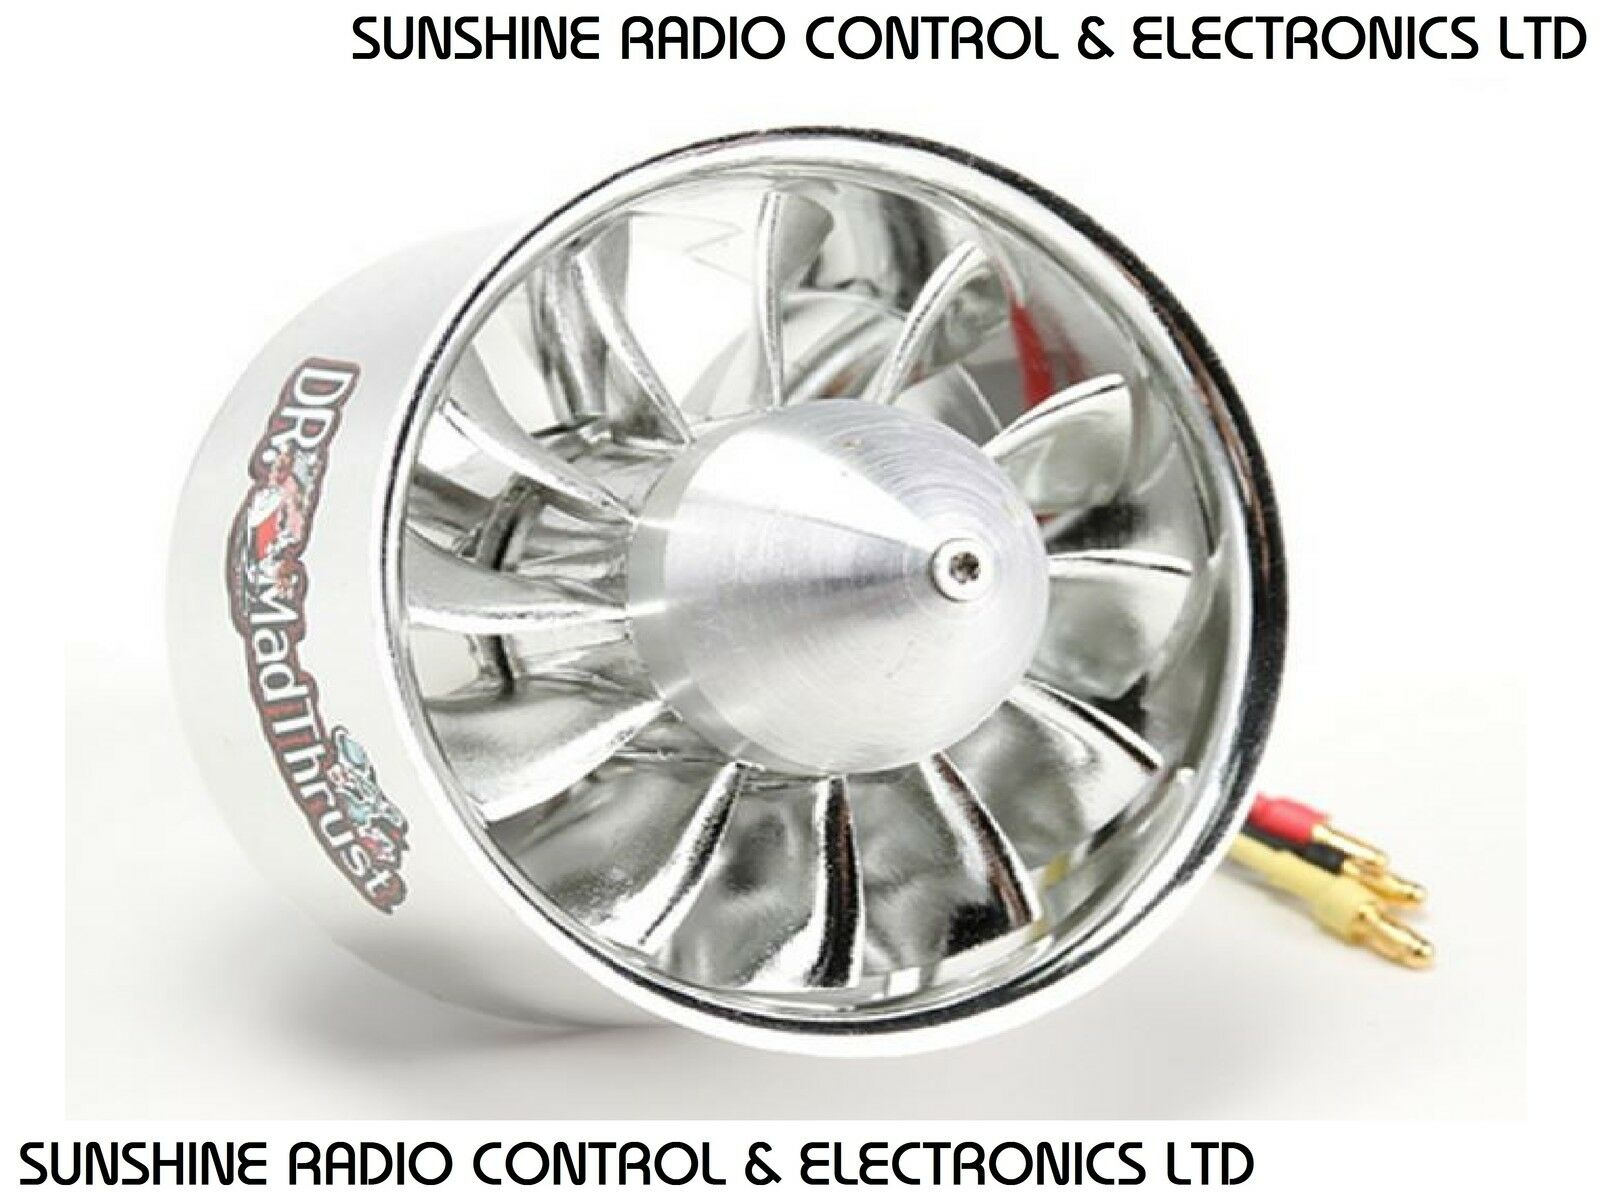 rc 77mm 12 blade edf electric ducted fan assembly 1600kv 6s 2 3kg thrust new uk ebay. Black Bedroom Furniture Sets. Home Design Ideas